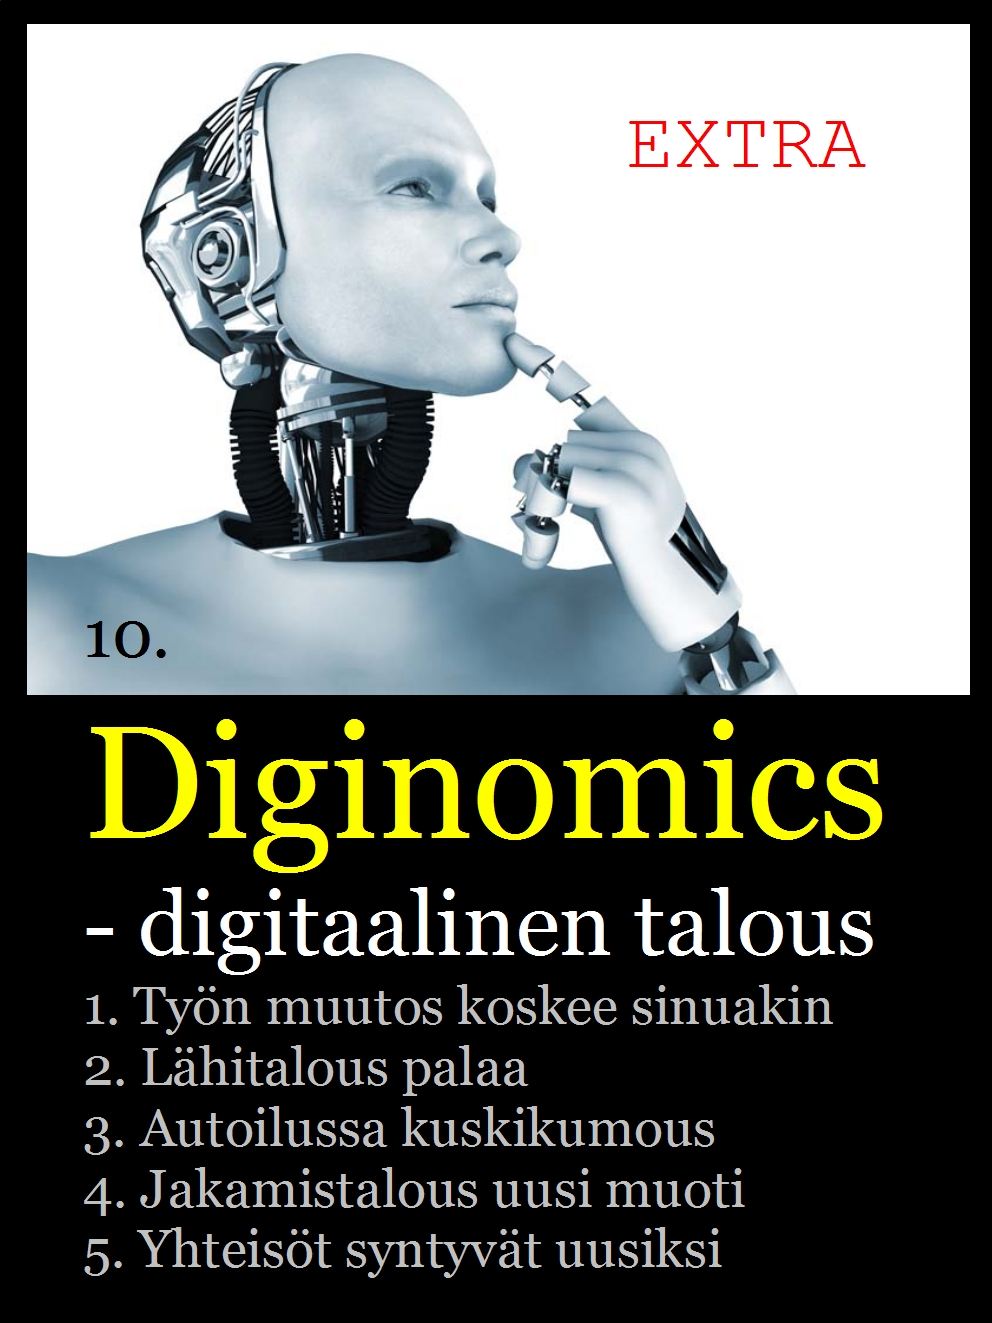 DIGINOMICS is a possibility